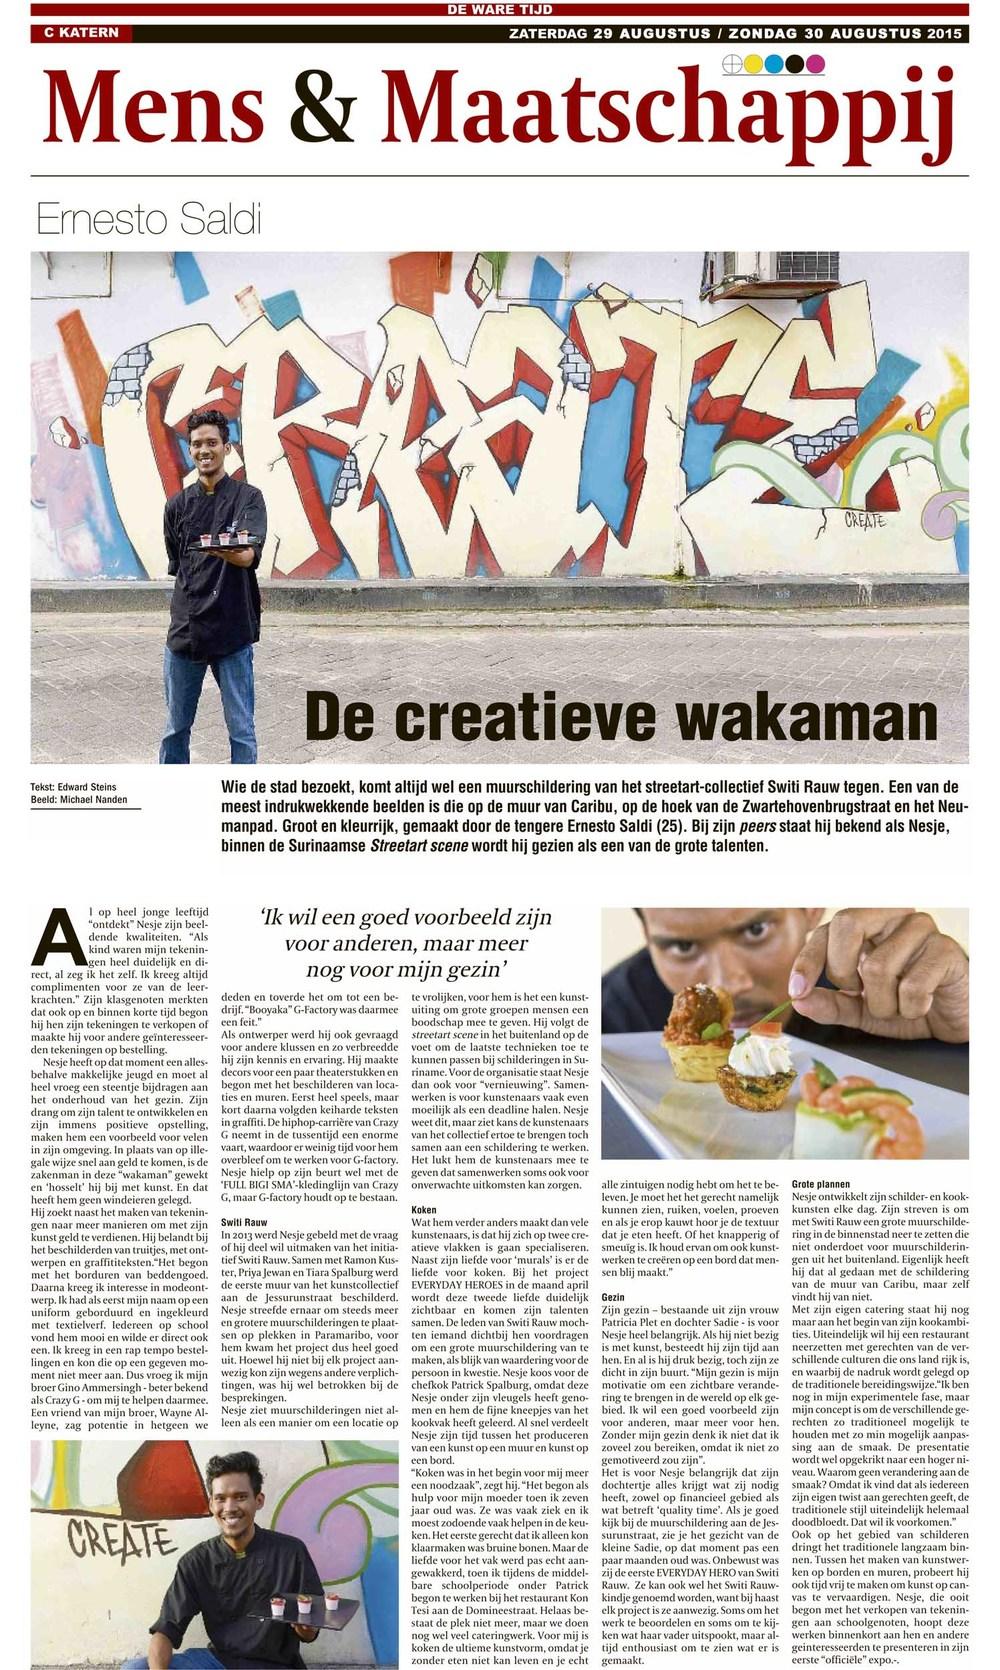 pdf_krant 15-08-29-21.jpg